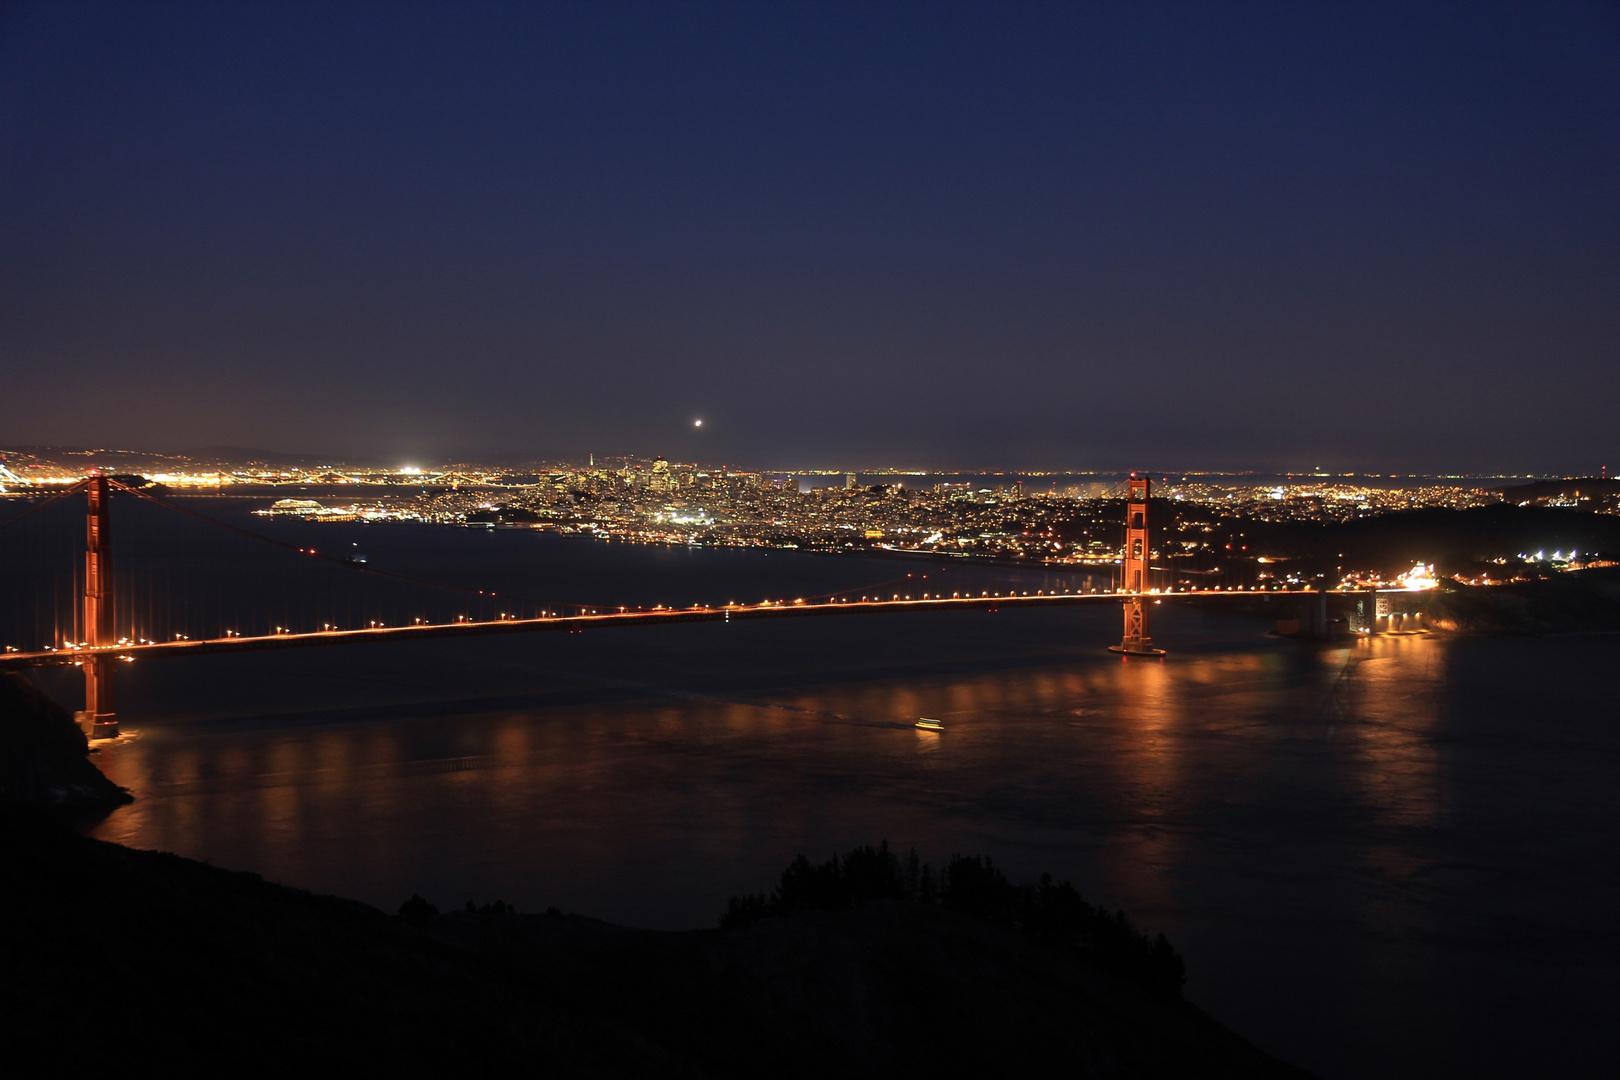 Golden Gate / San Francisco @night